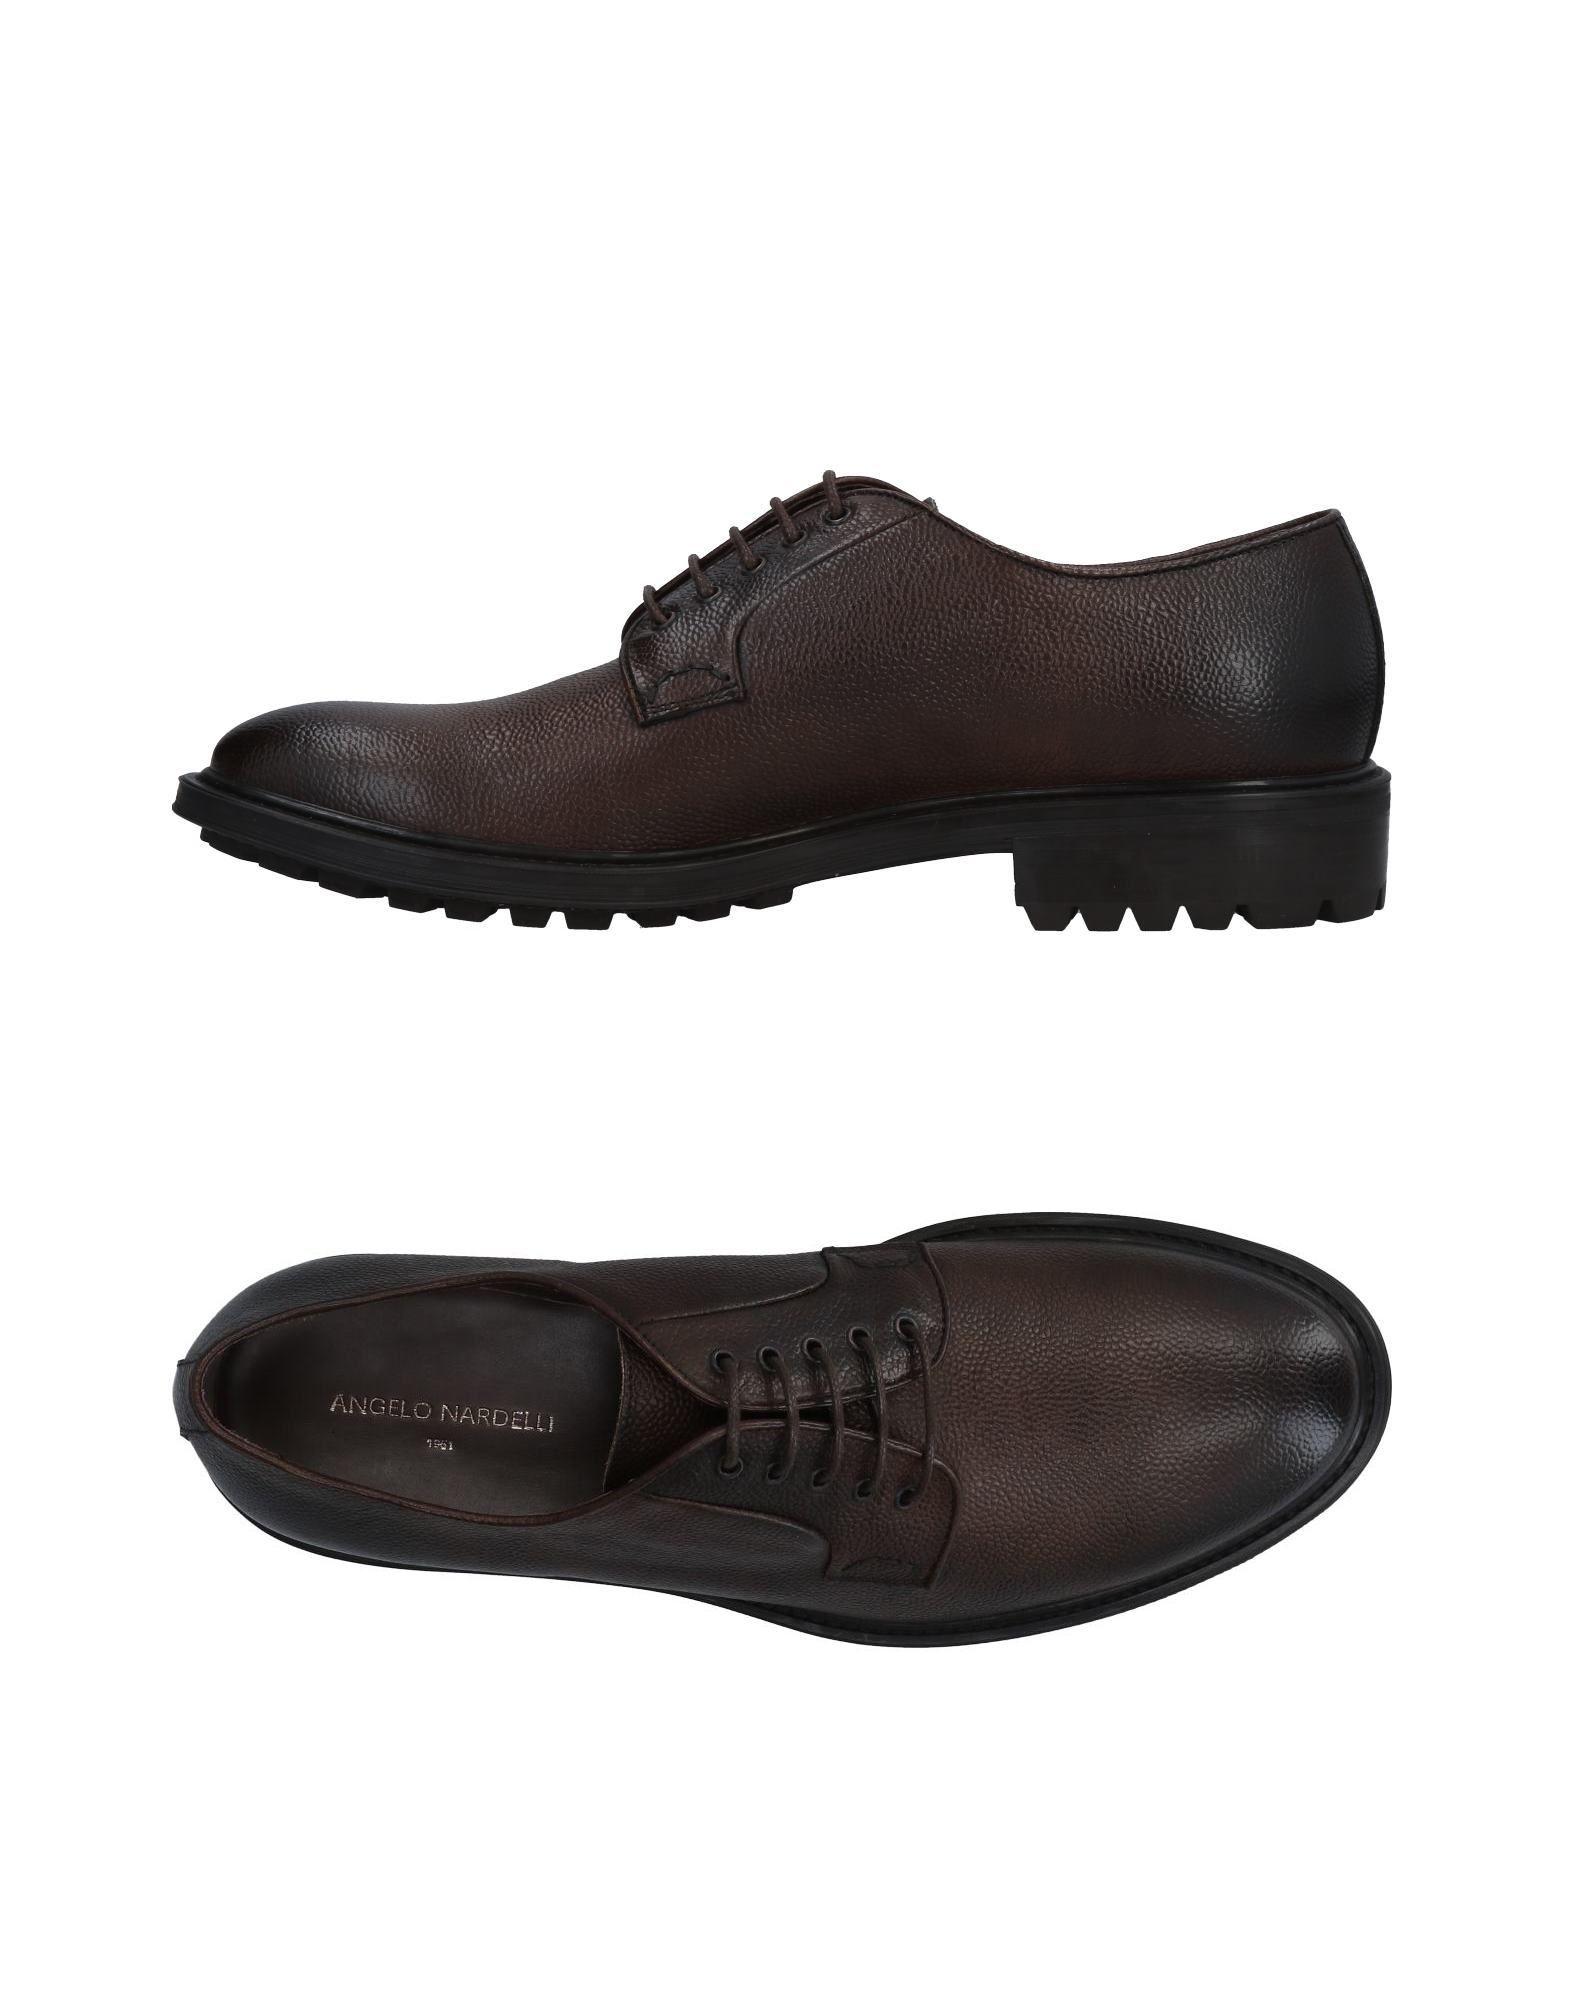 Rabatt echte Schuhe Angelo 11486157AE Nardelli Schnürschuhe Herren  11486157AE Angelo b54e7d